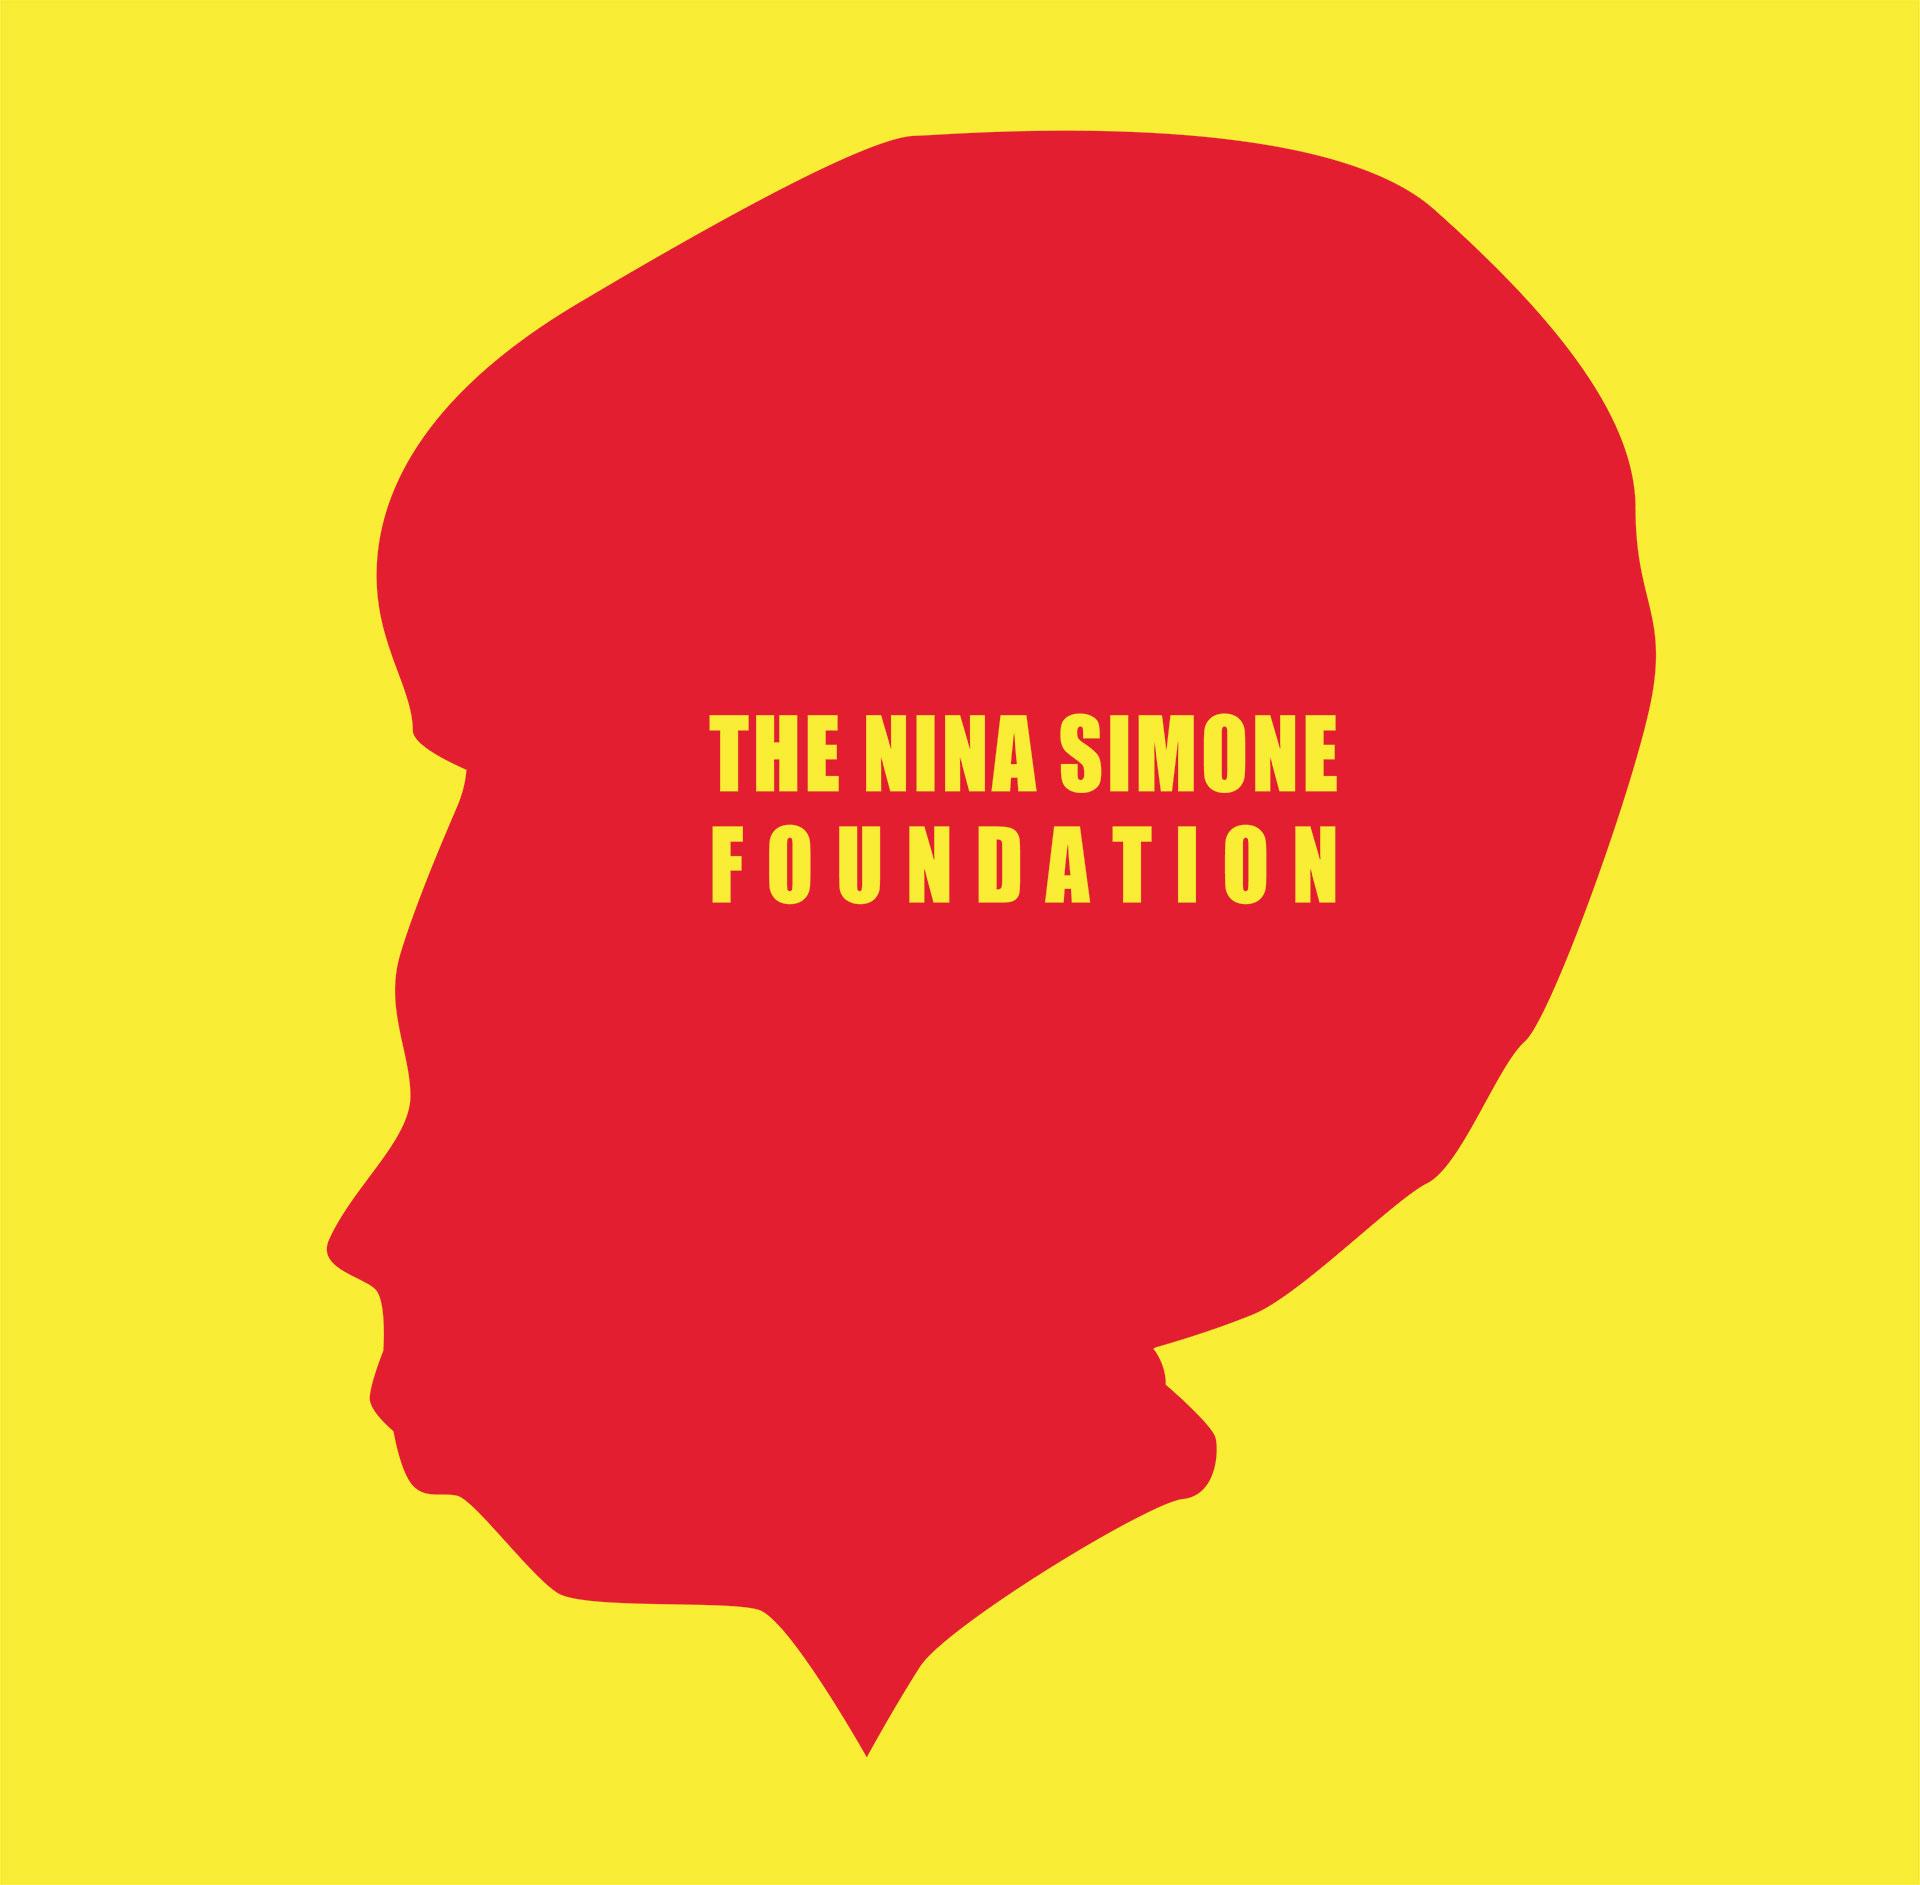 notfromhere-nina-simon-foundation-logo-design_gili barshay